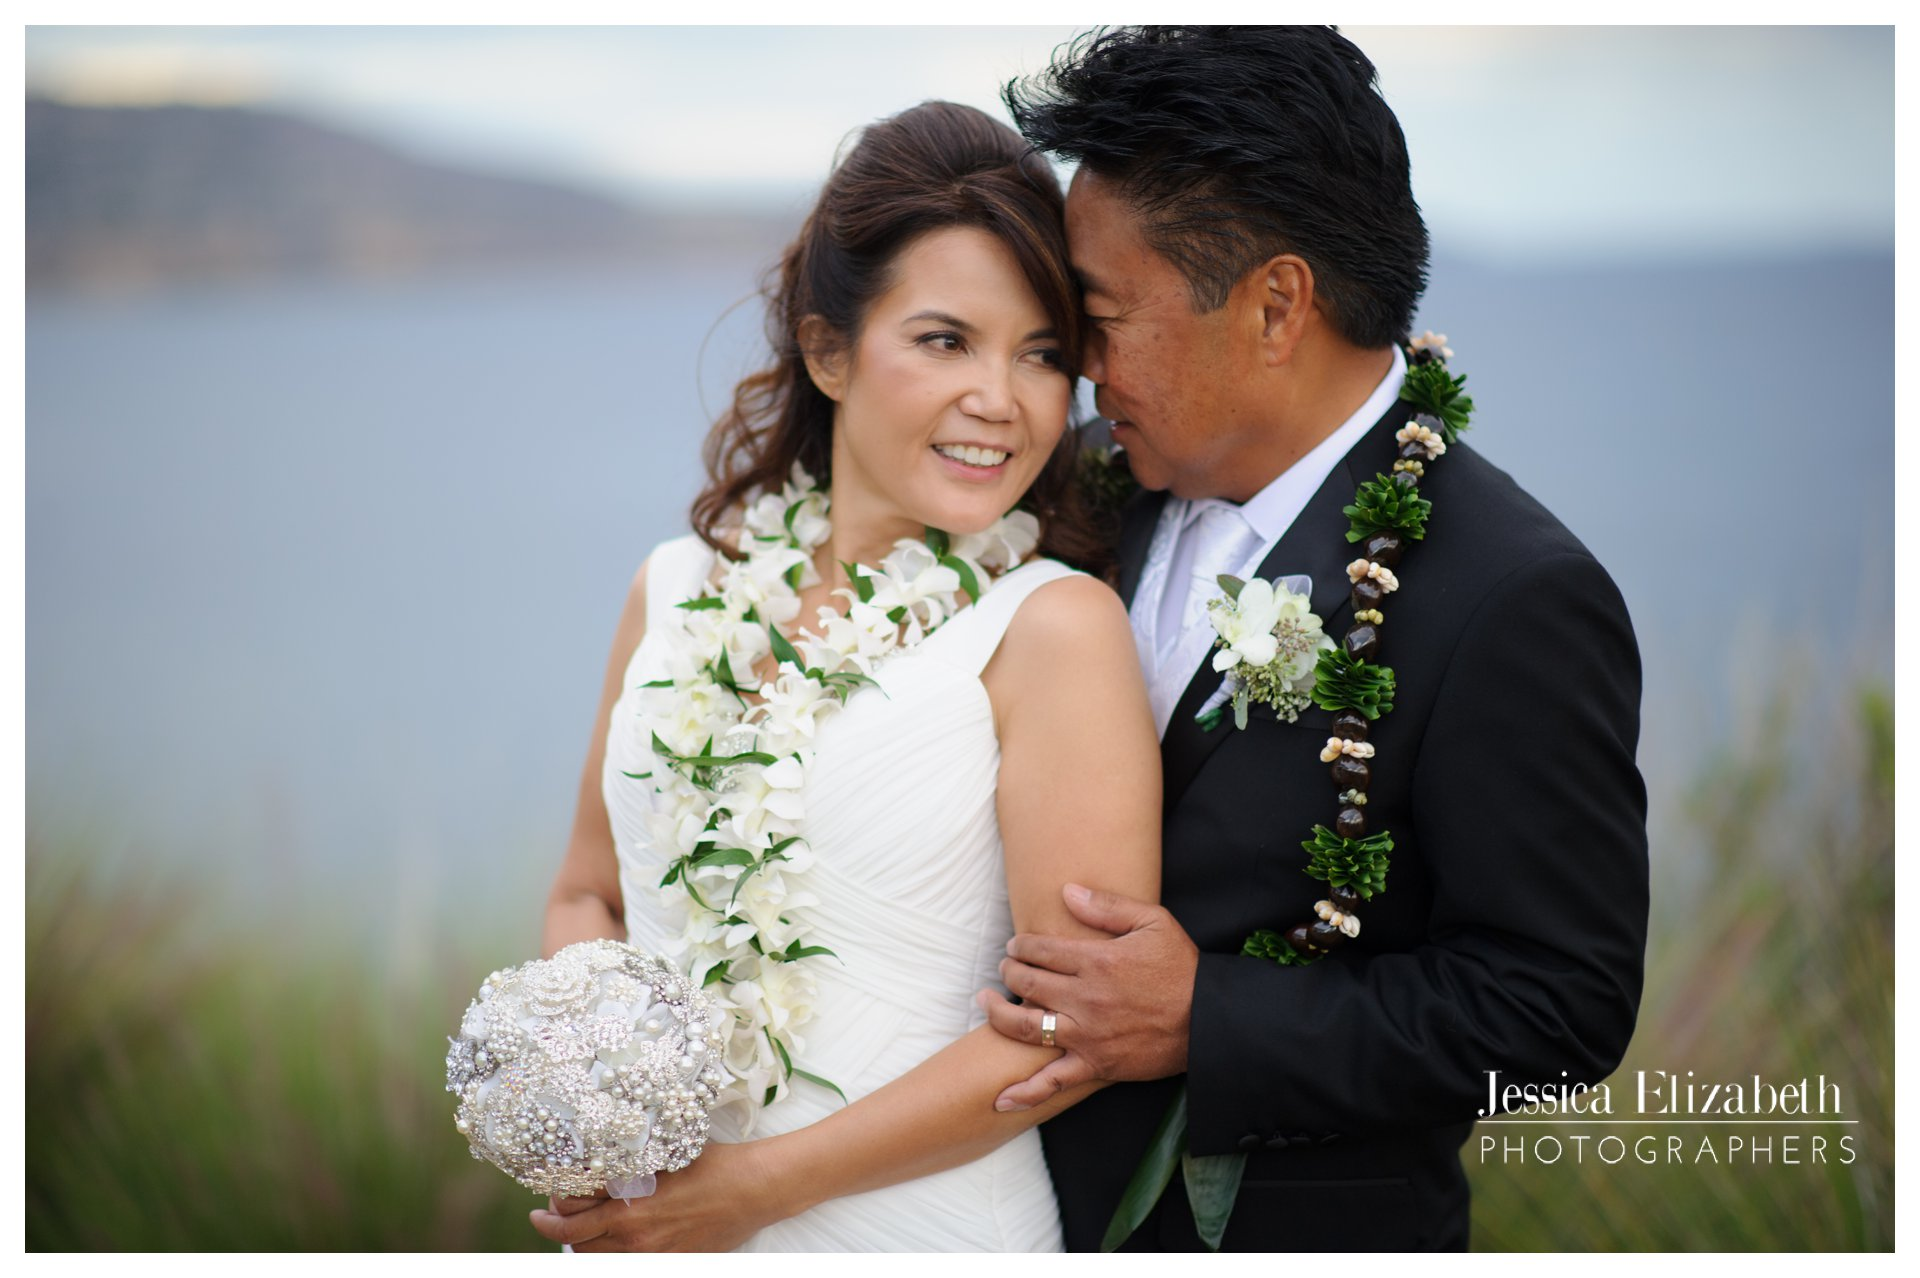 36-Terranea-Palos-Verdes-Wedding-Photography-by-Jessica-Elizabeth-w.jpg